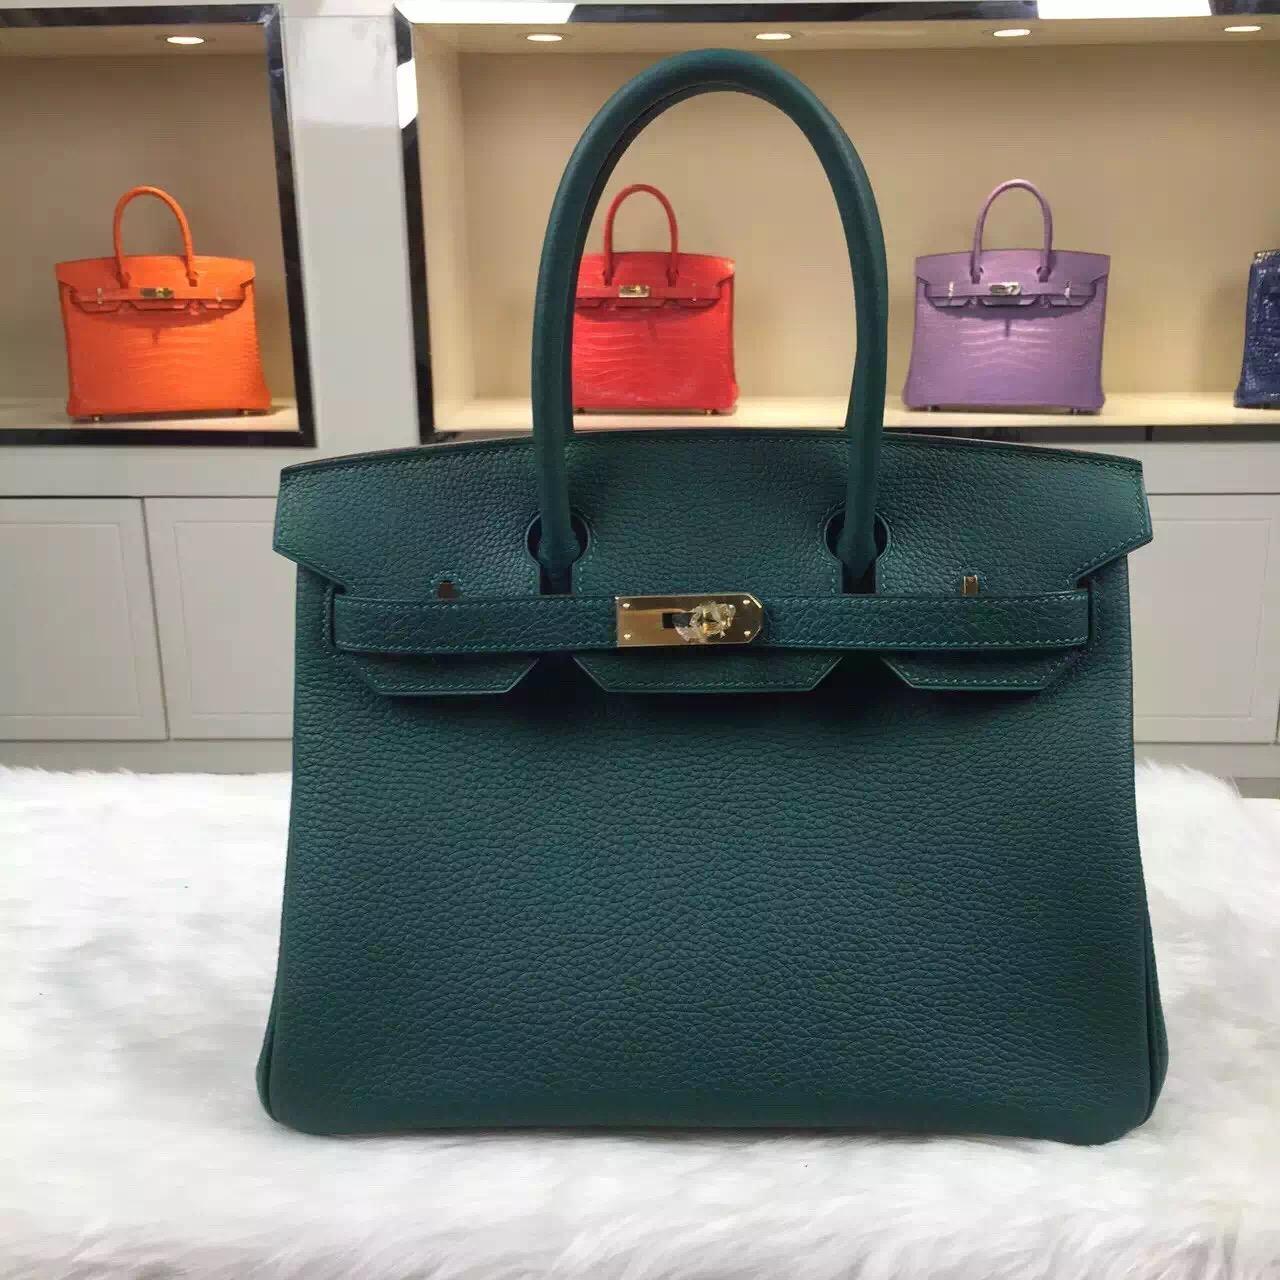 Online Shop Hermes Z6 Malachite Green Original Togo Leather Birkin Bag 30CM